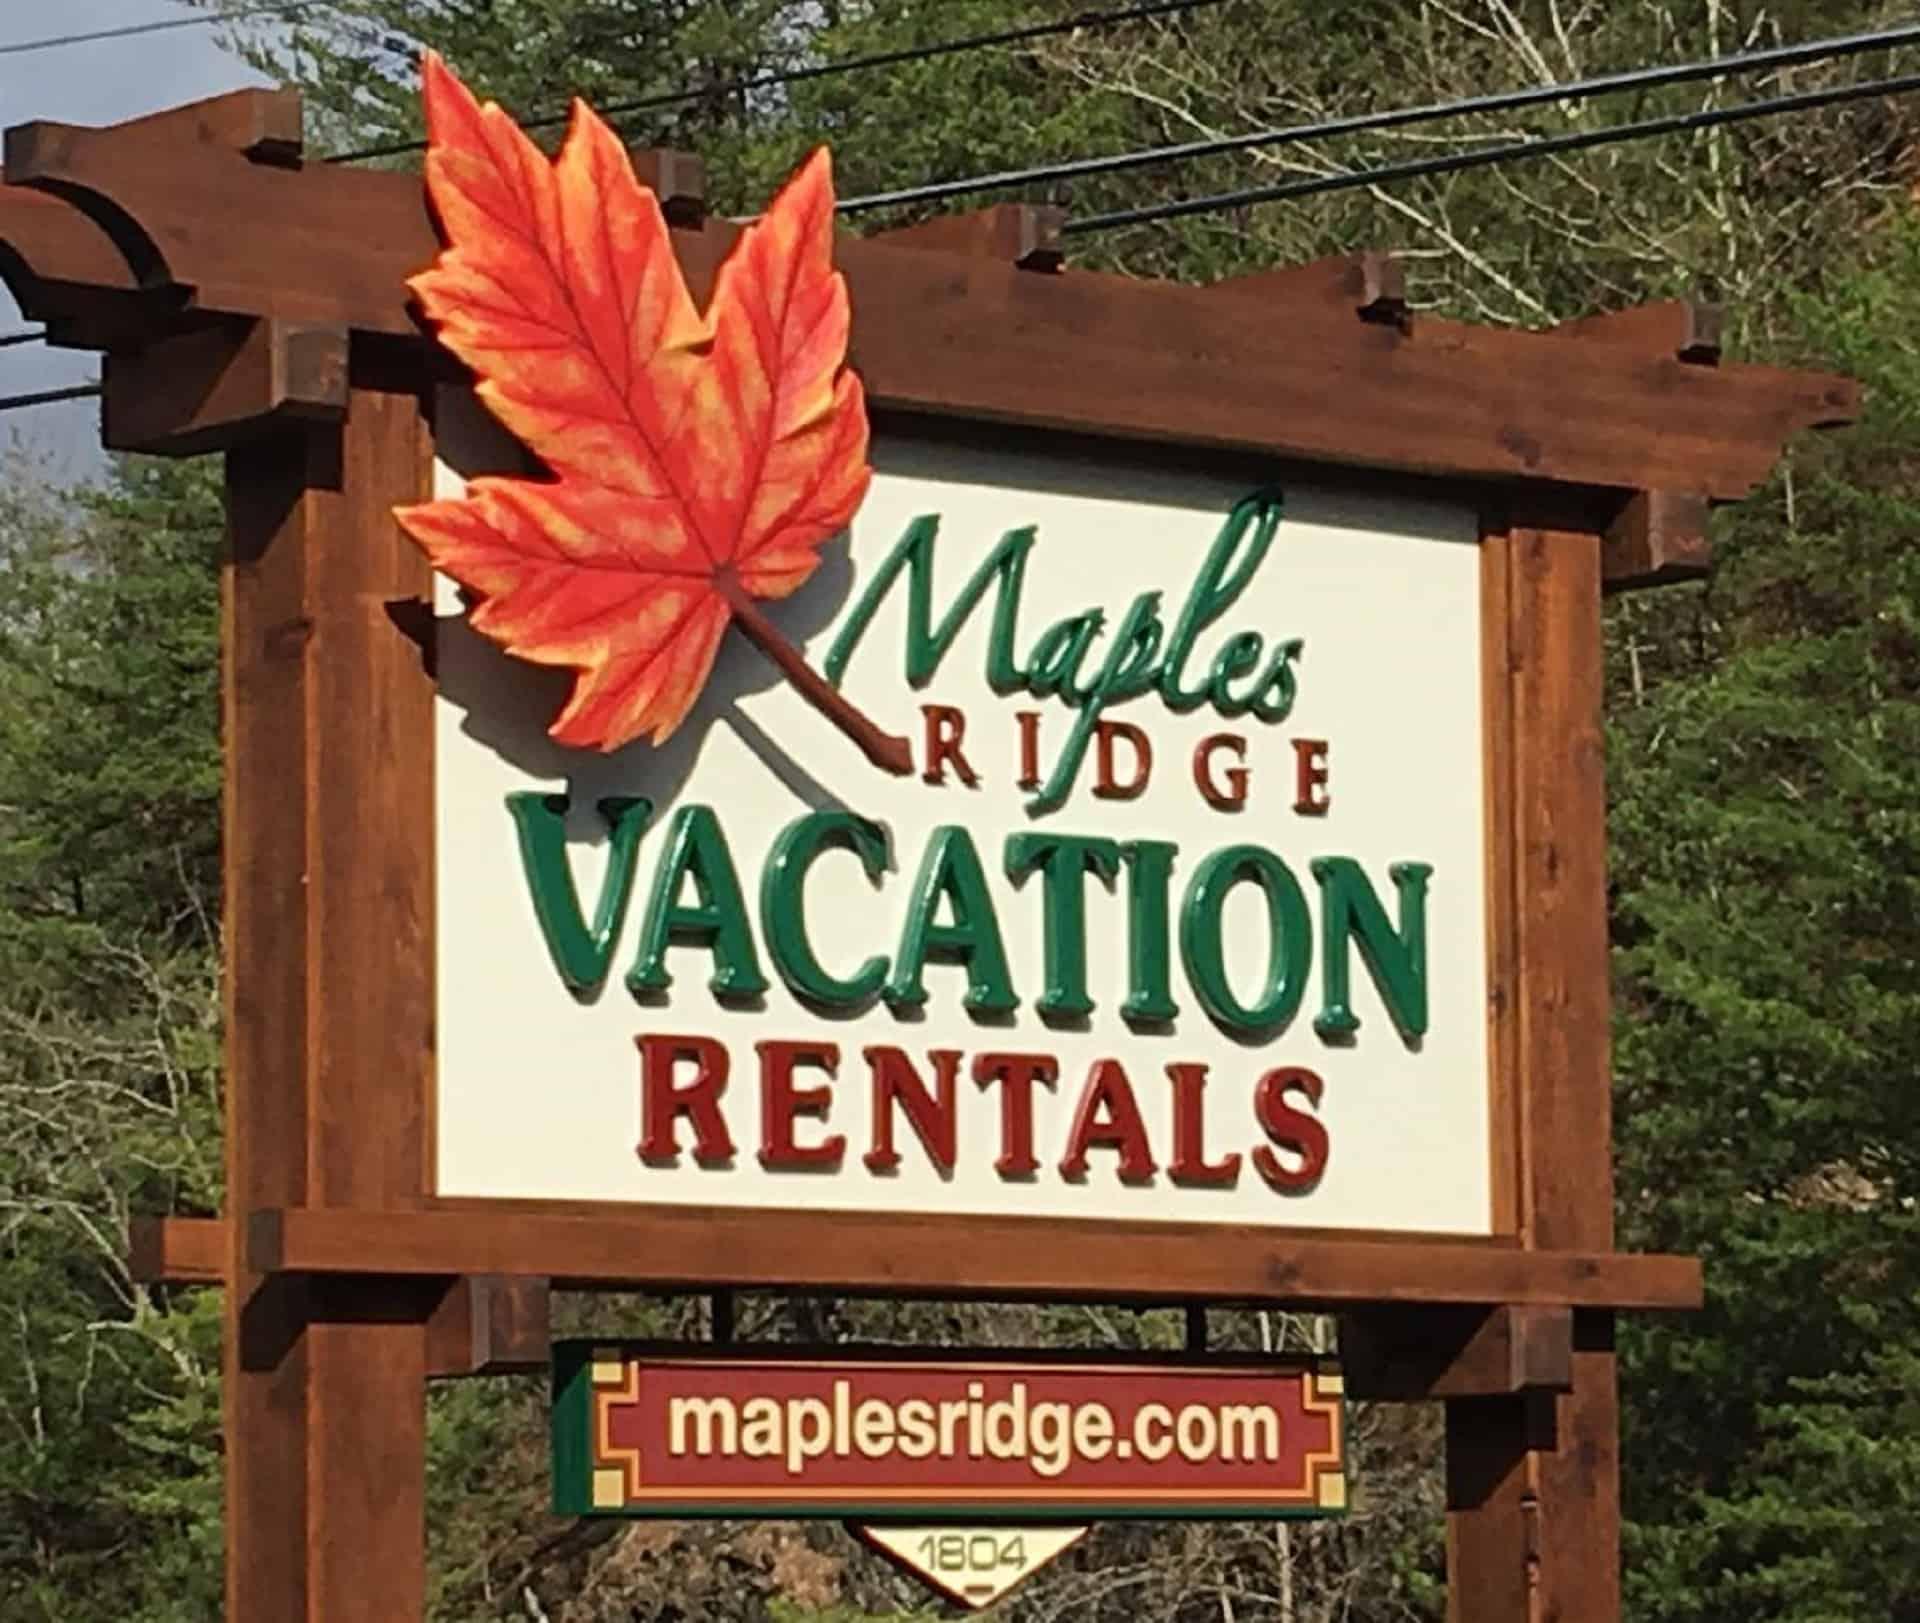 Maples Ridge Vacation Rentals